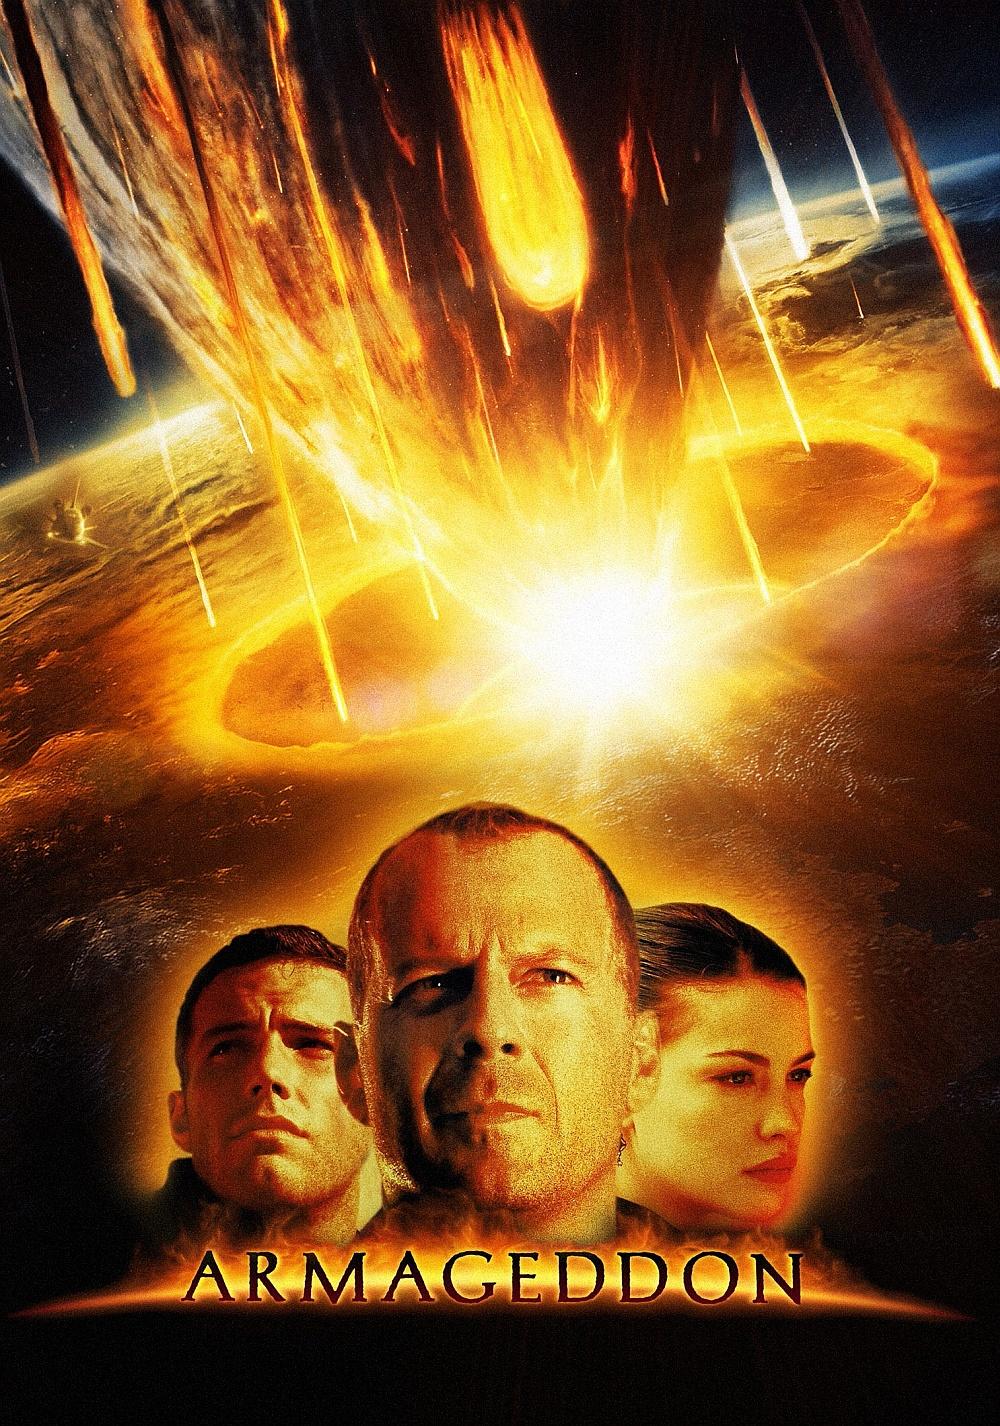 ARMAGEDDON (1998) TAMIL DUBBED HD